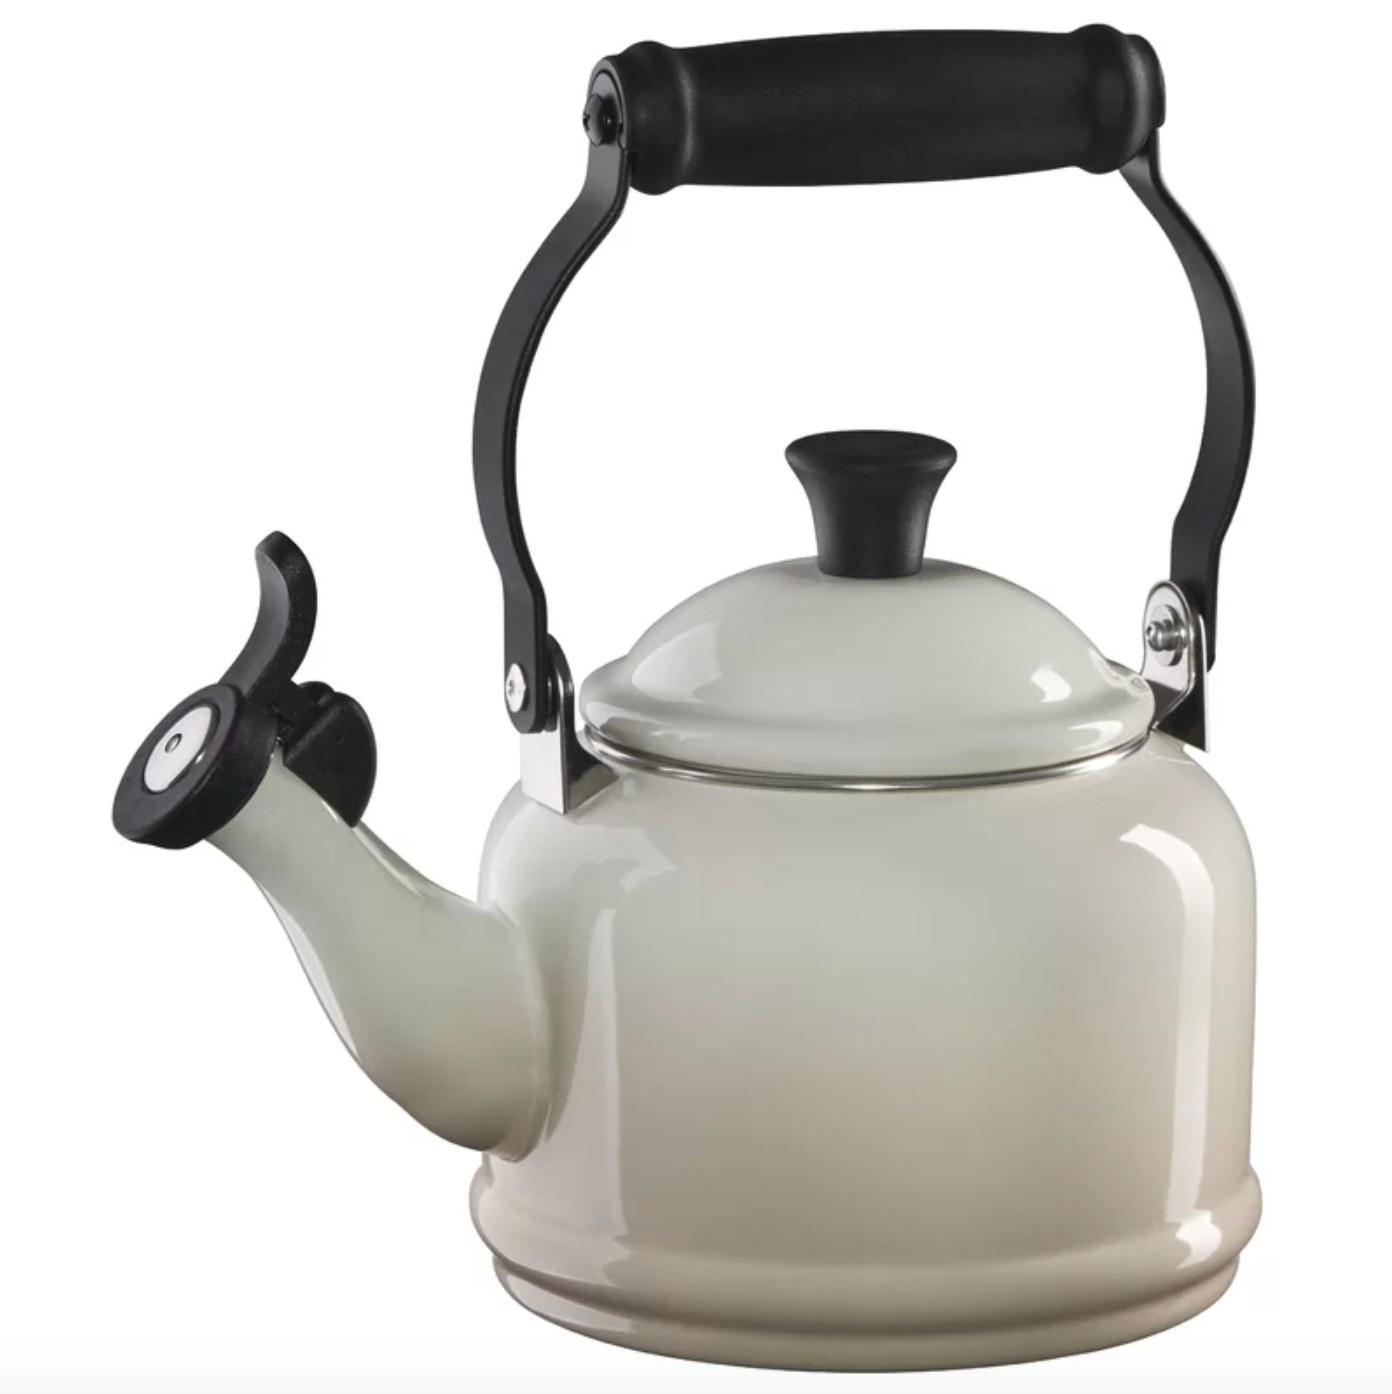 The Le Creuset enamel tea pot in meringue